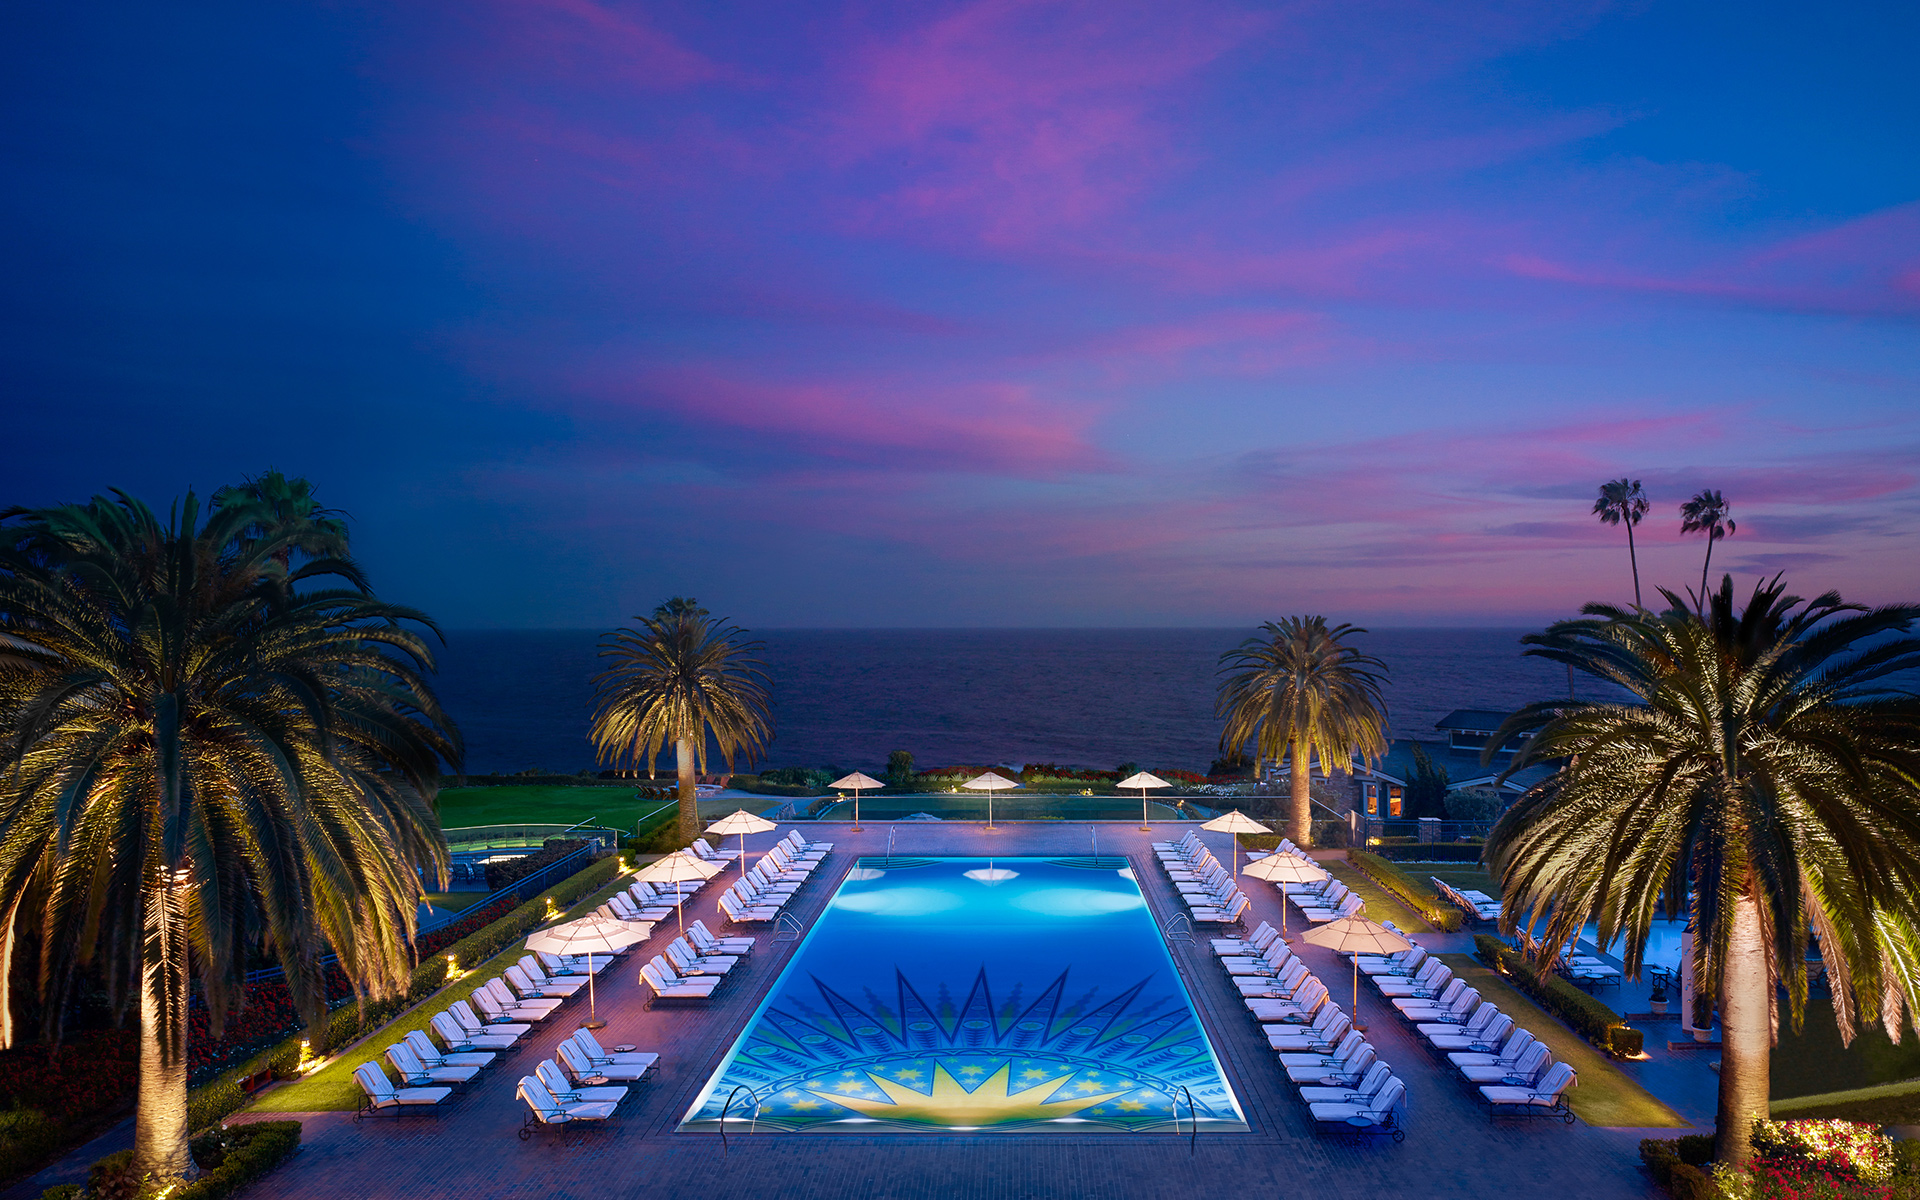 mlb-pool-sunset.jpg